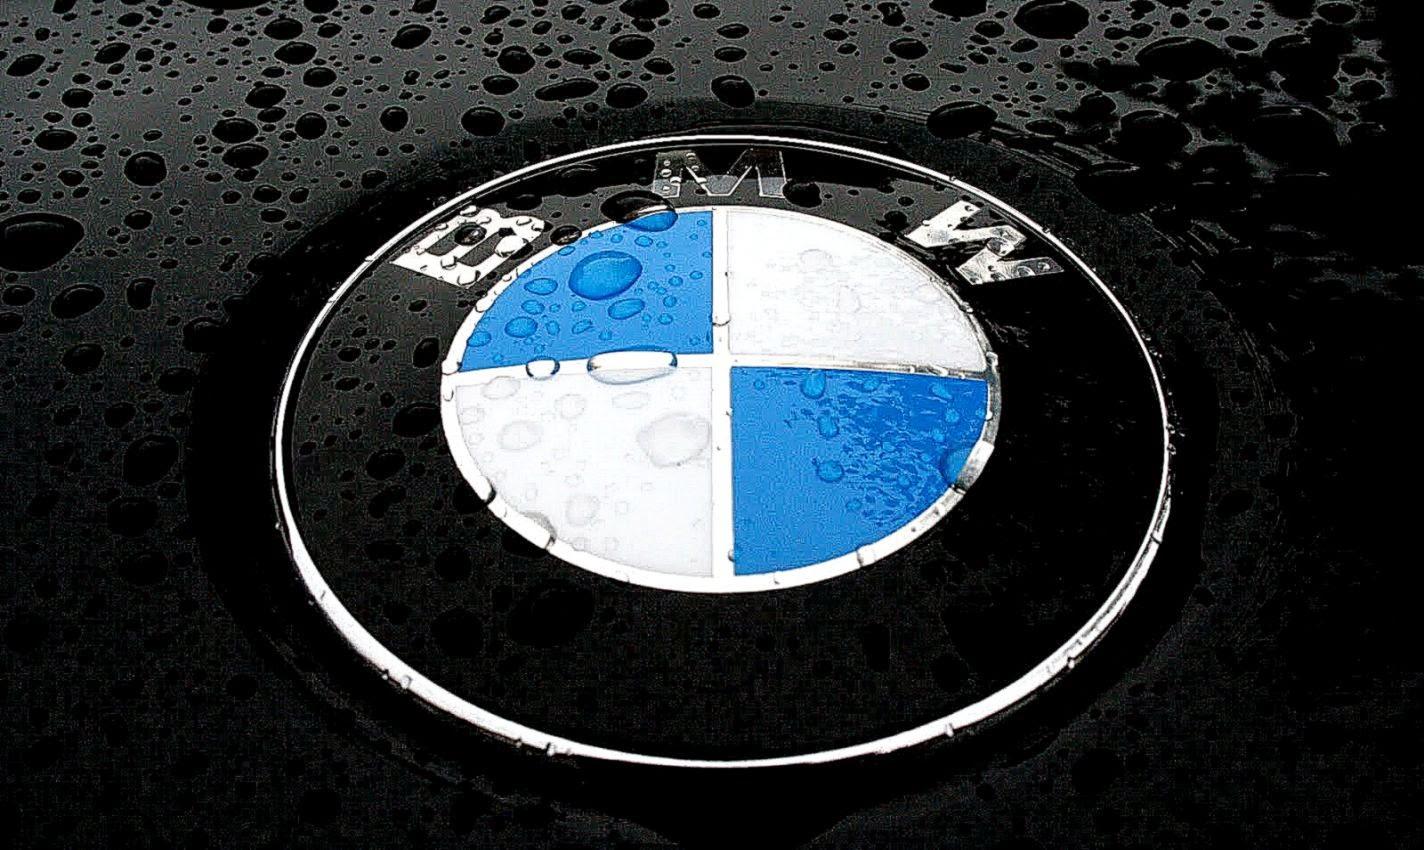 Bmw Logo Images Hd Desktop | All HD Wallpapers